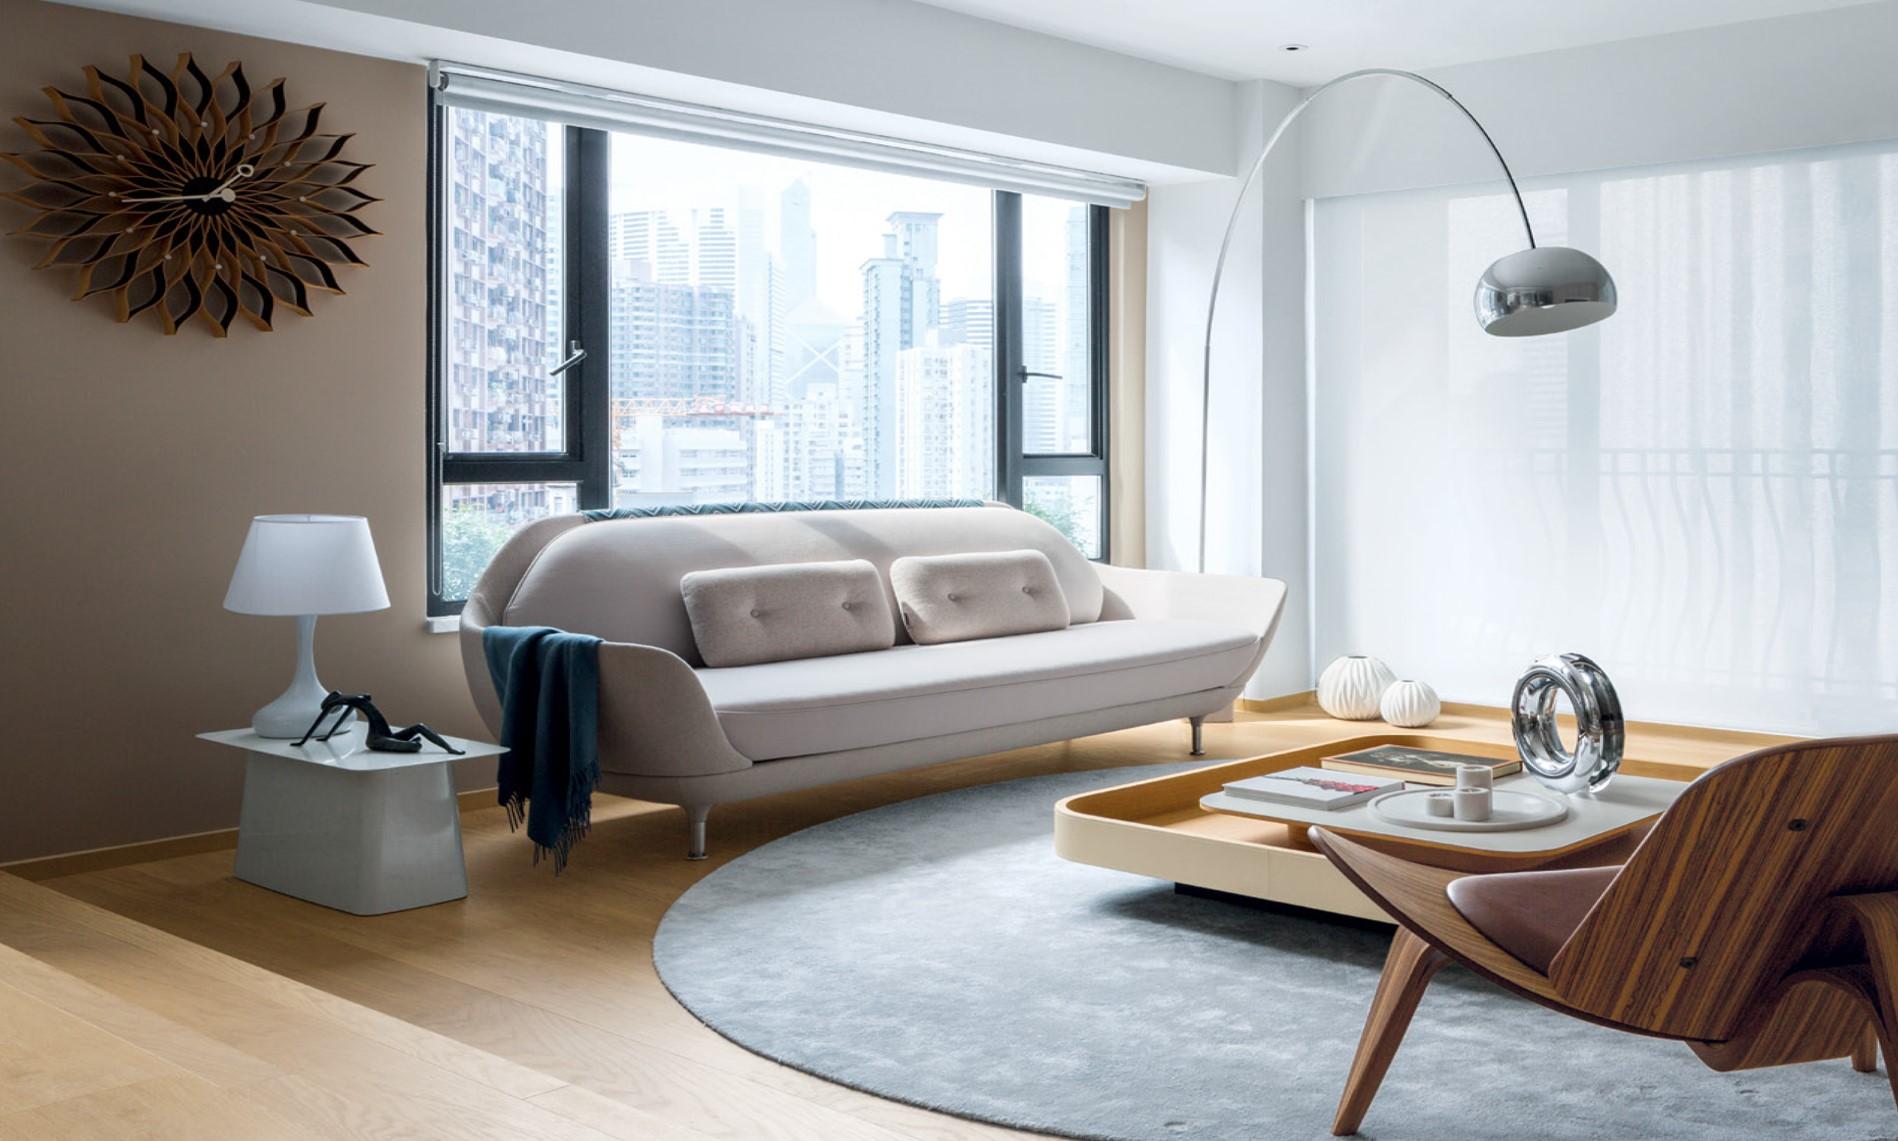 Hong Kong Interior Designers: Our Top 10 Modern Chairs hong kong interior designers Hong Kong Interior Designers: Our Top 10 Modern Chairs Hong Kong Interior Designers Our Top 10 Modern Chairs 5